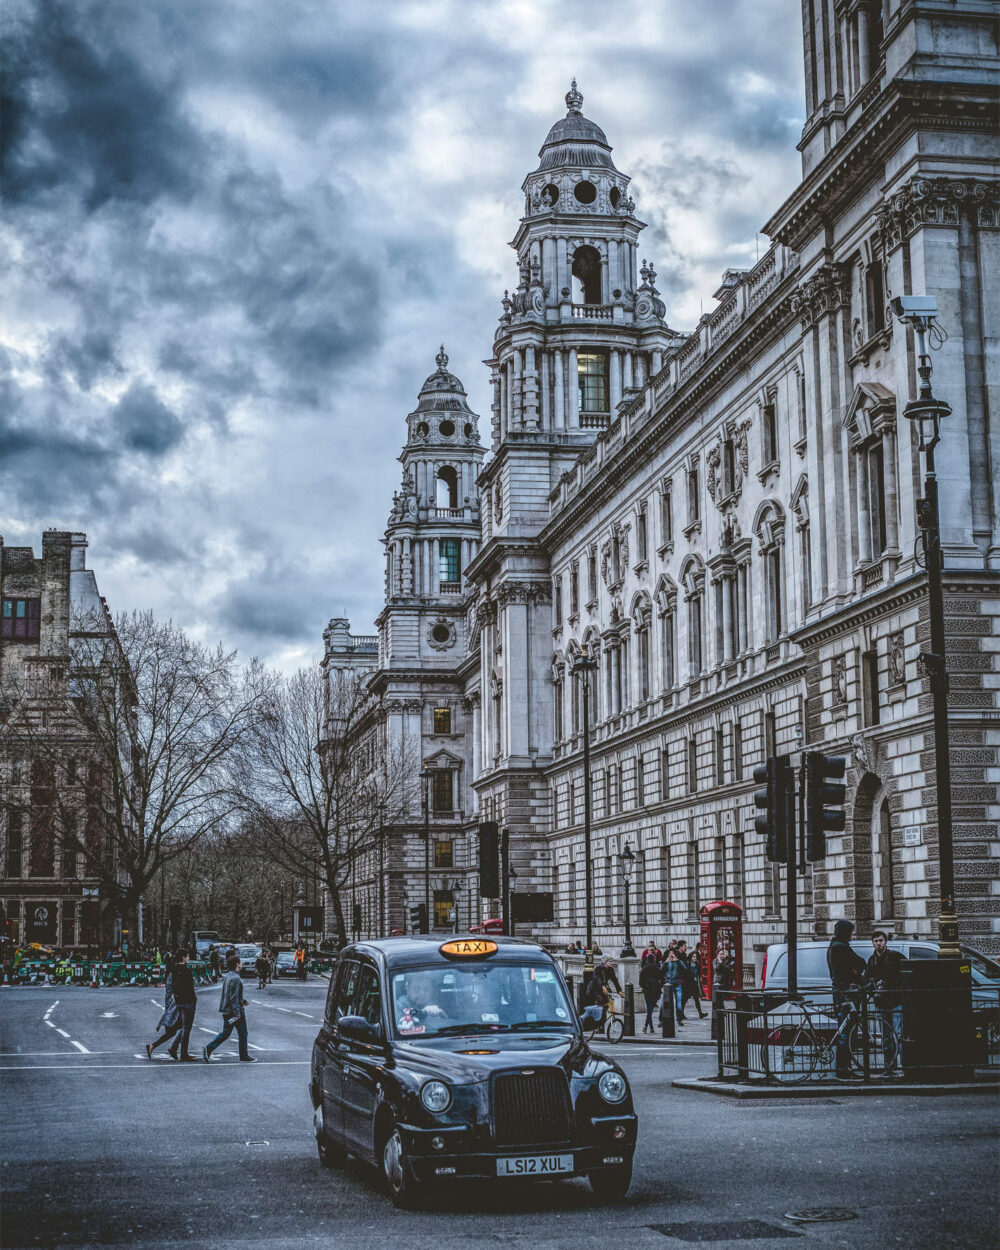 Straßenszene in London mit London Black Cab